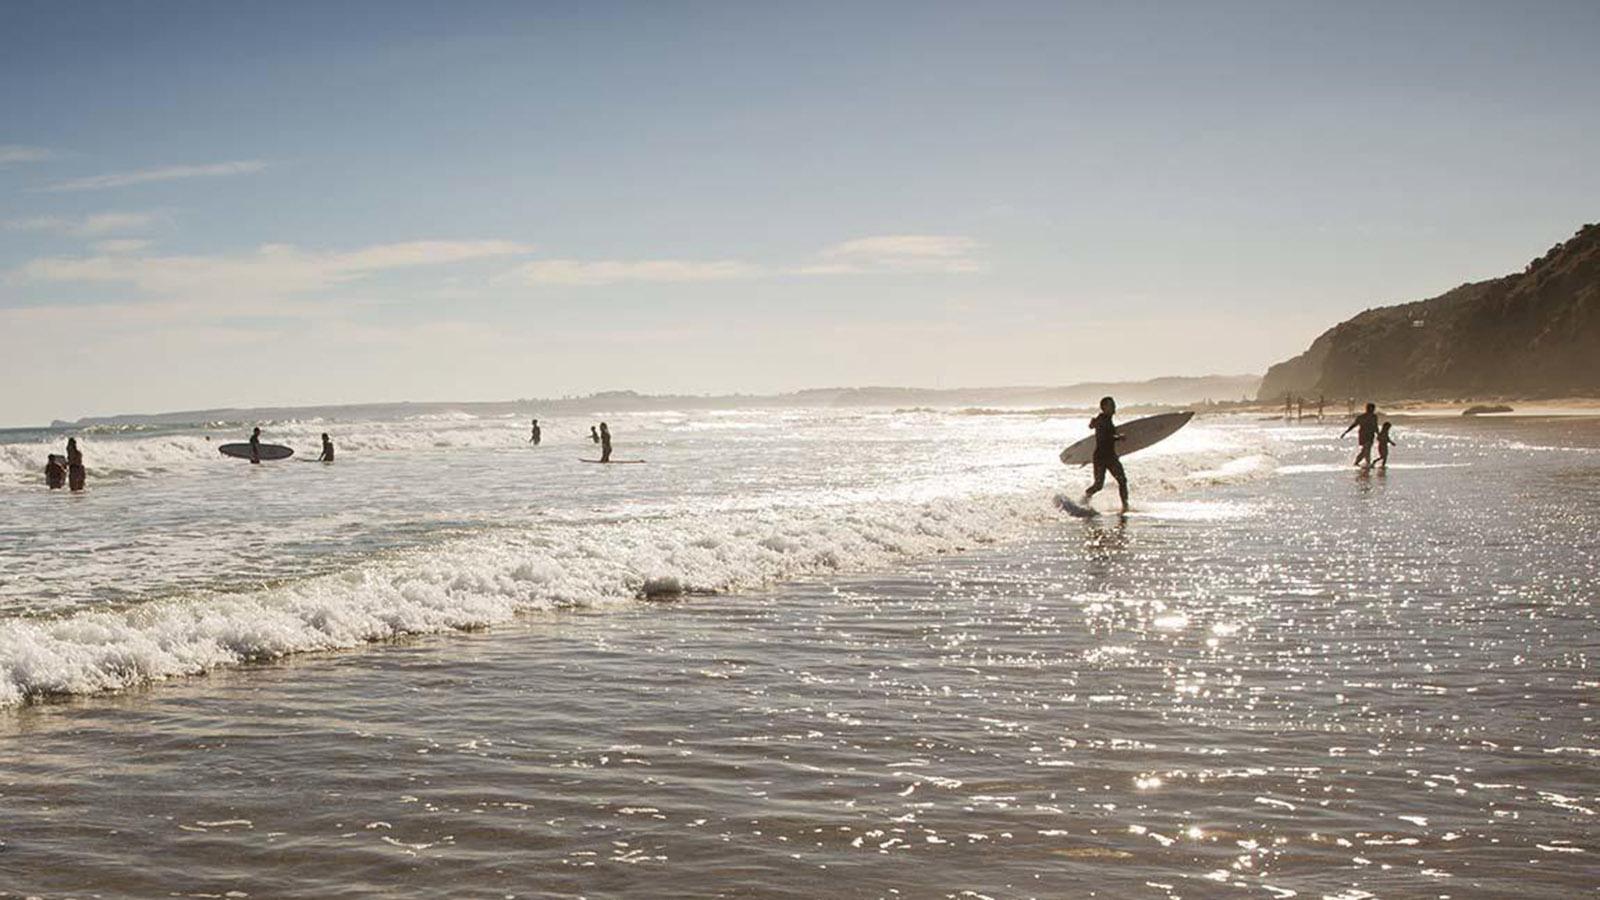 Surfing, Phillip Island, Victoria, Australia